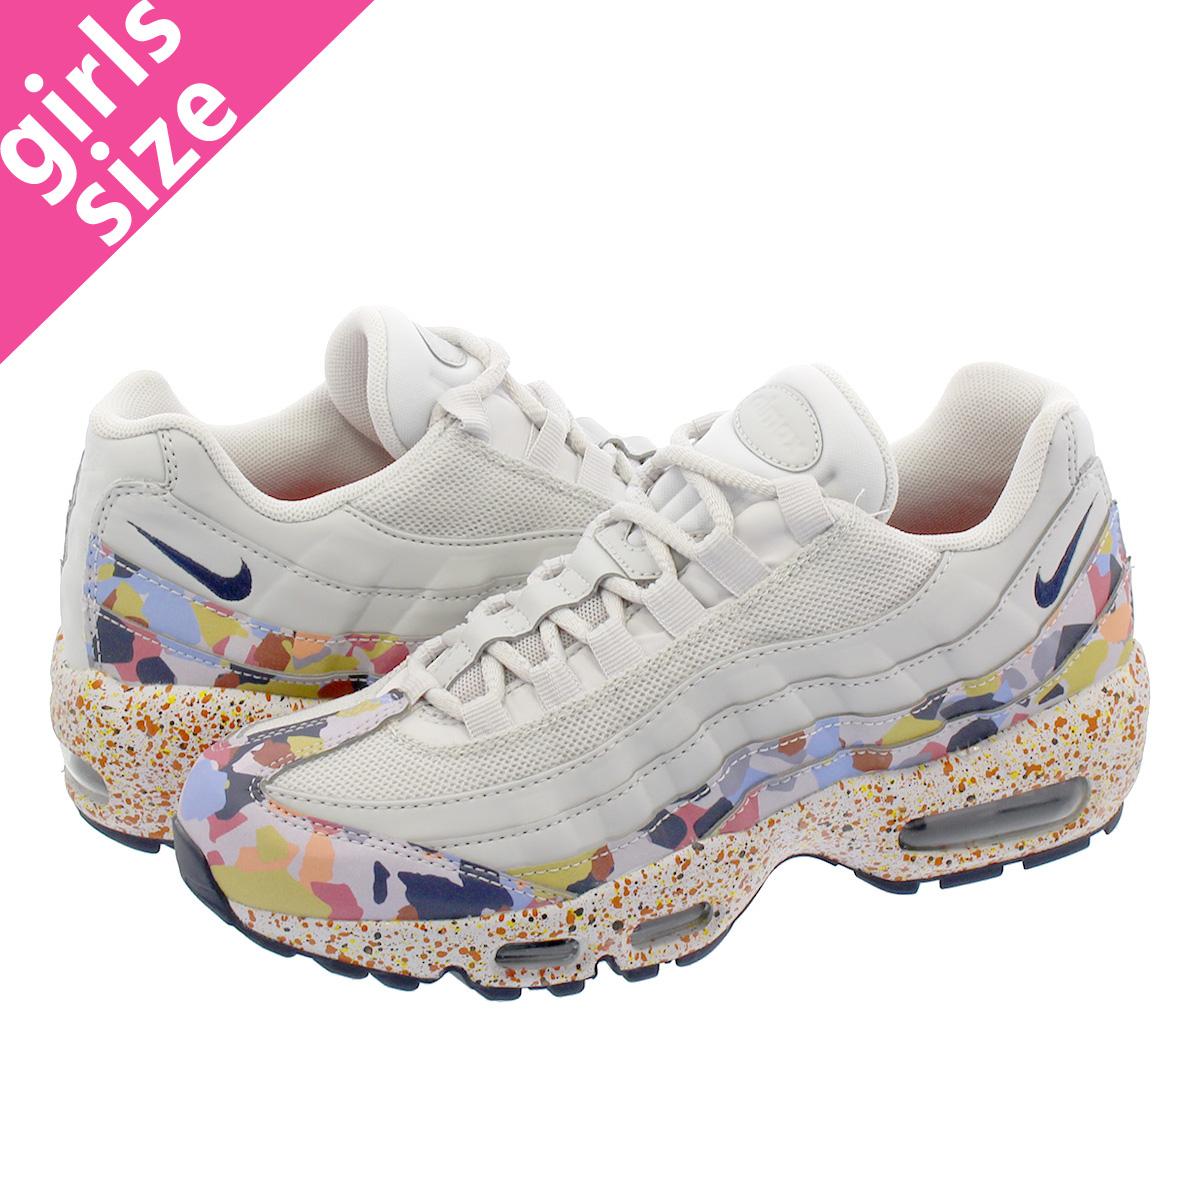 uk availability 18b14 e47f5 NIKE WMNS AIR MAX 95 SE Nike women Air Max 95 premium SE VAST GREY  ...